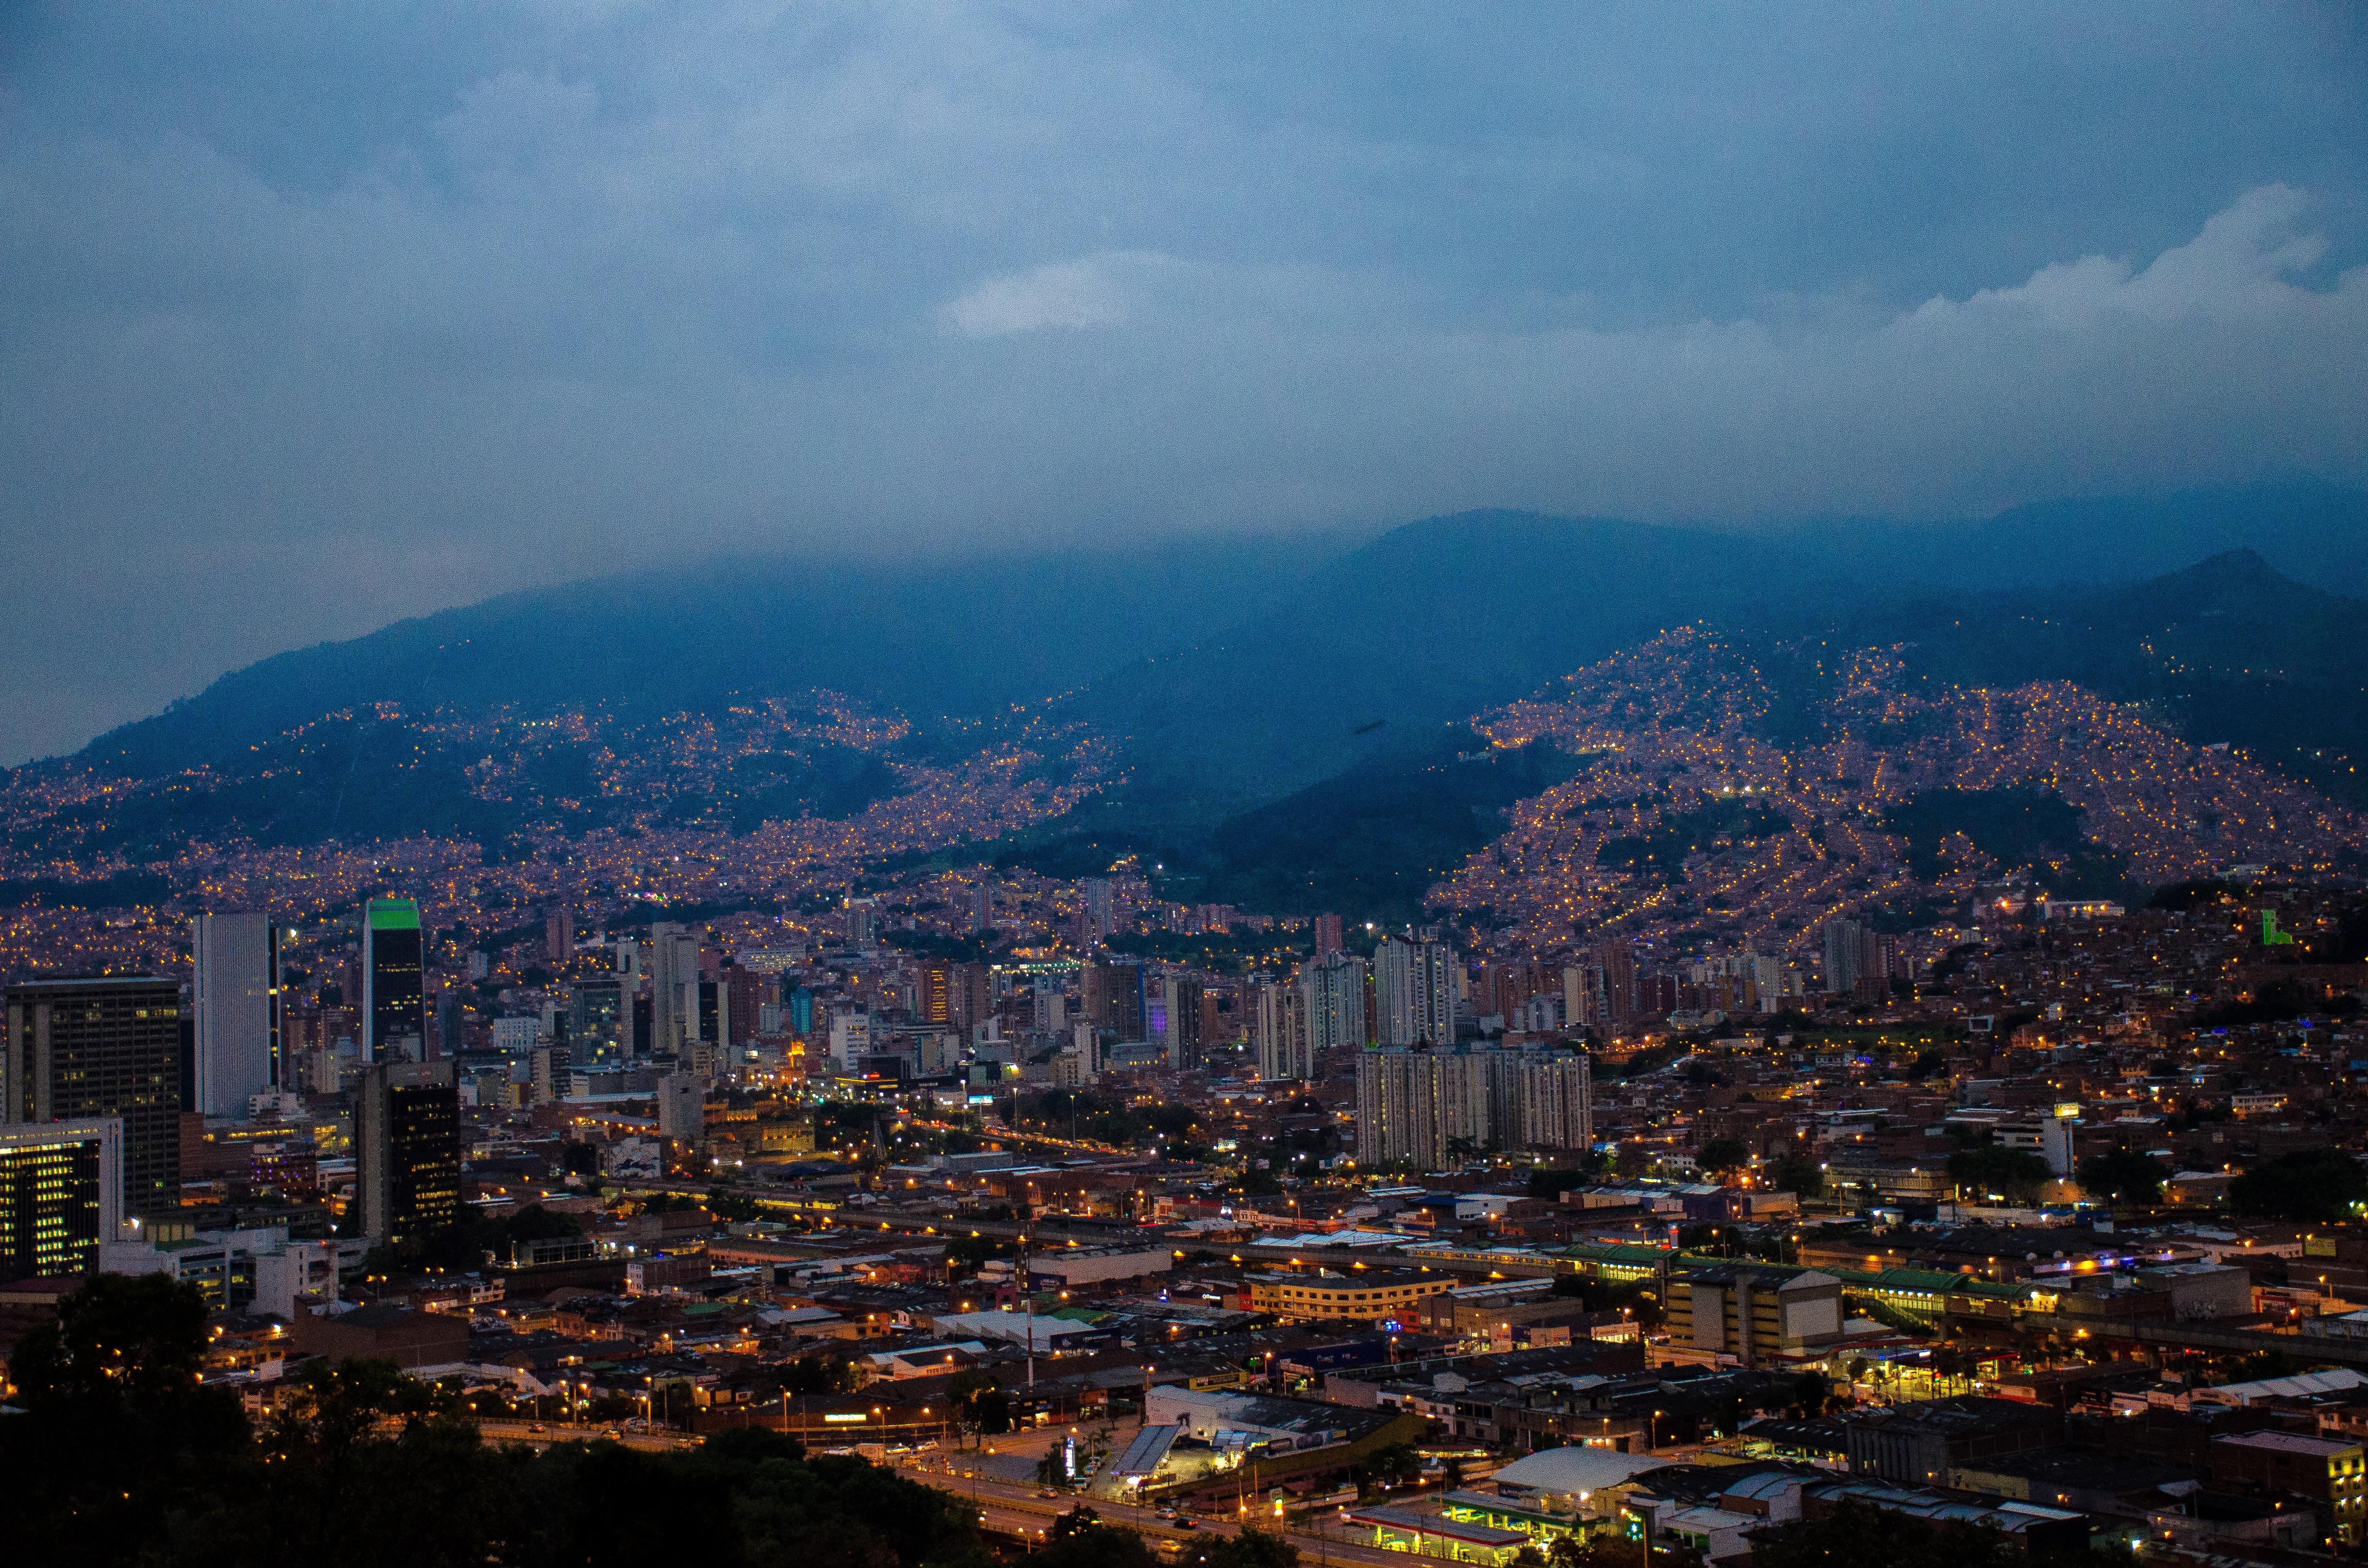 city scraper at night time